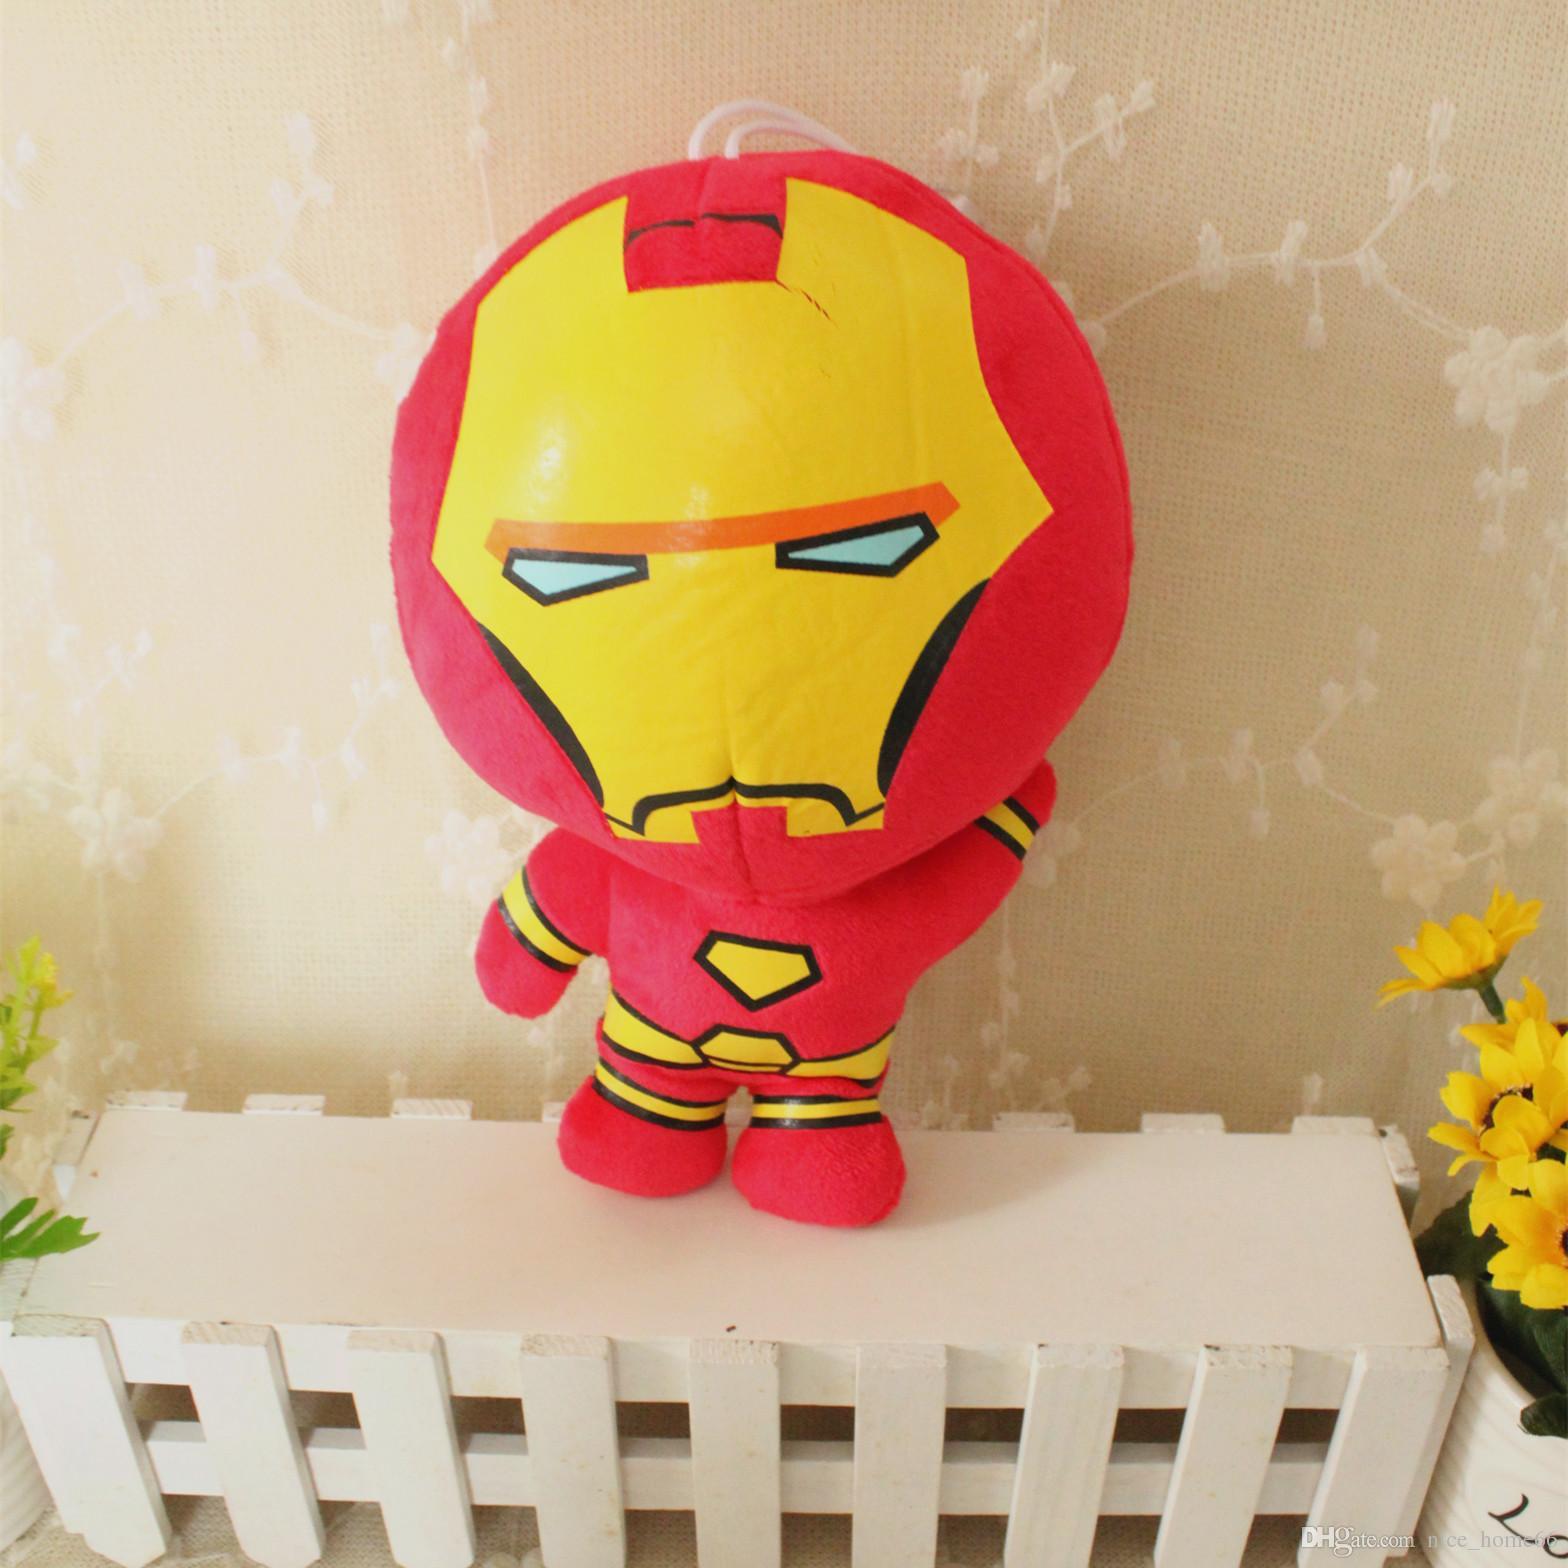 The Avengers 2 Plush Toys Iron Man Superhero Spiderman Thor Captain America Version Stuffed Dolls Soft PP Cotton Movie Action Figures